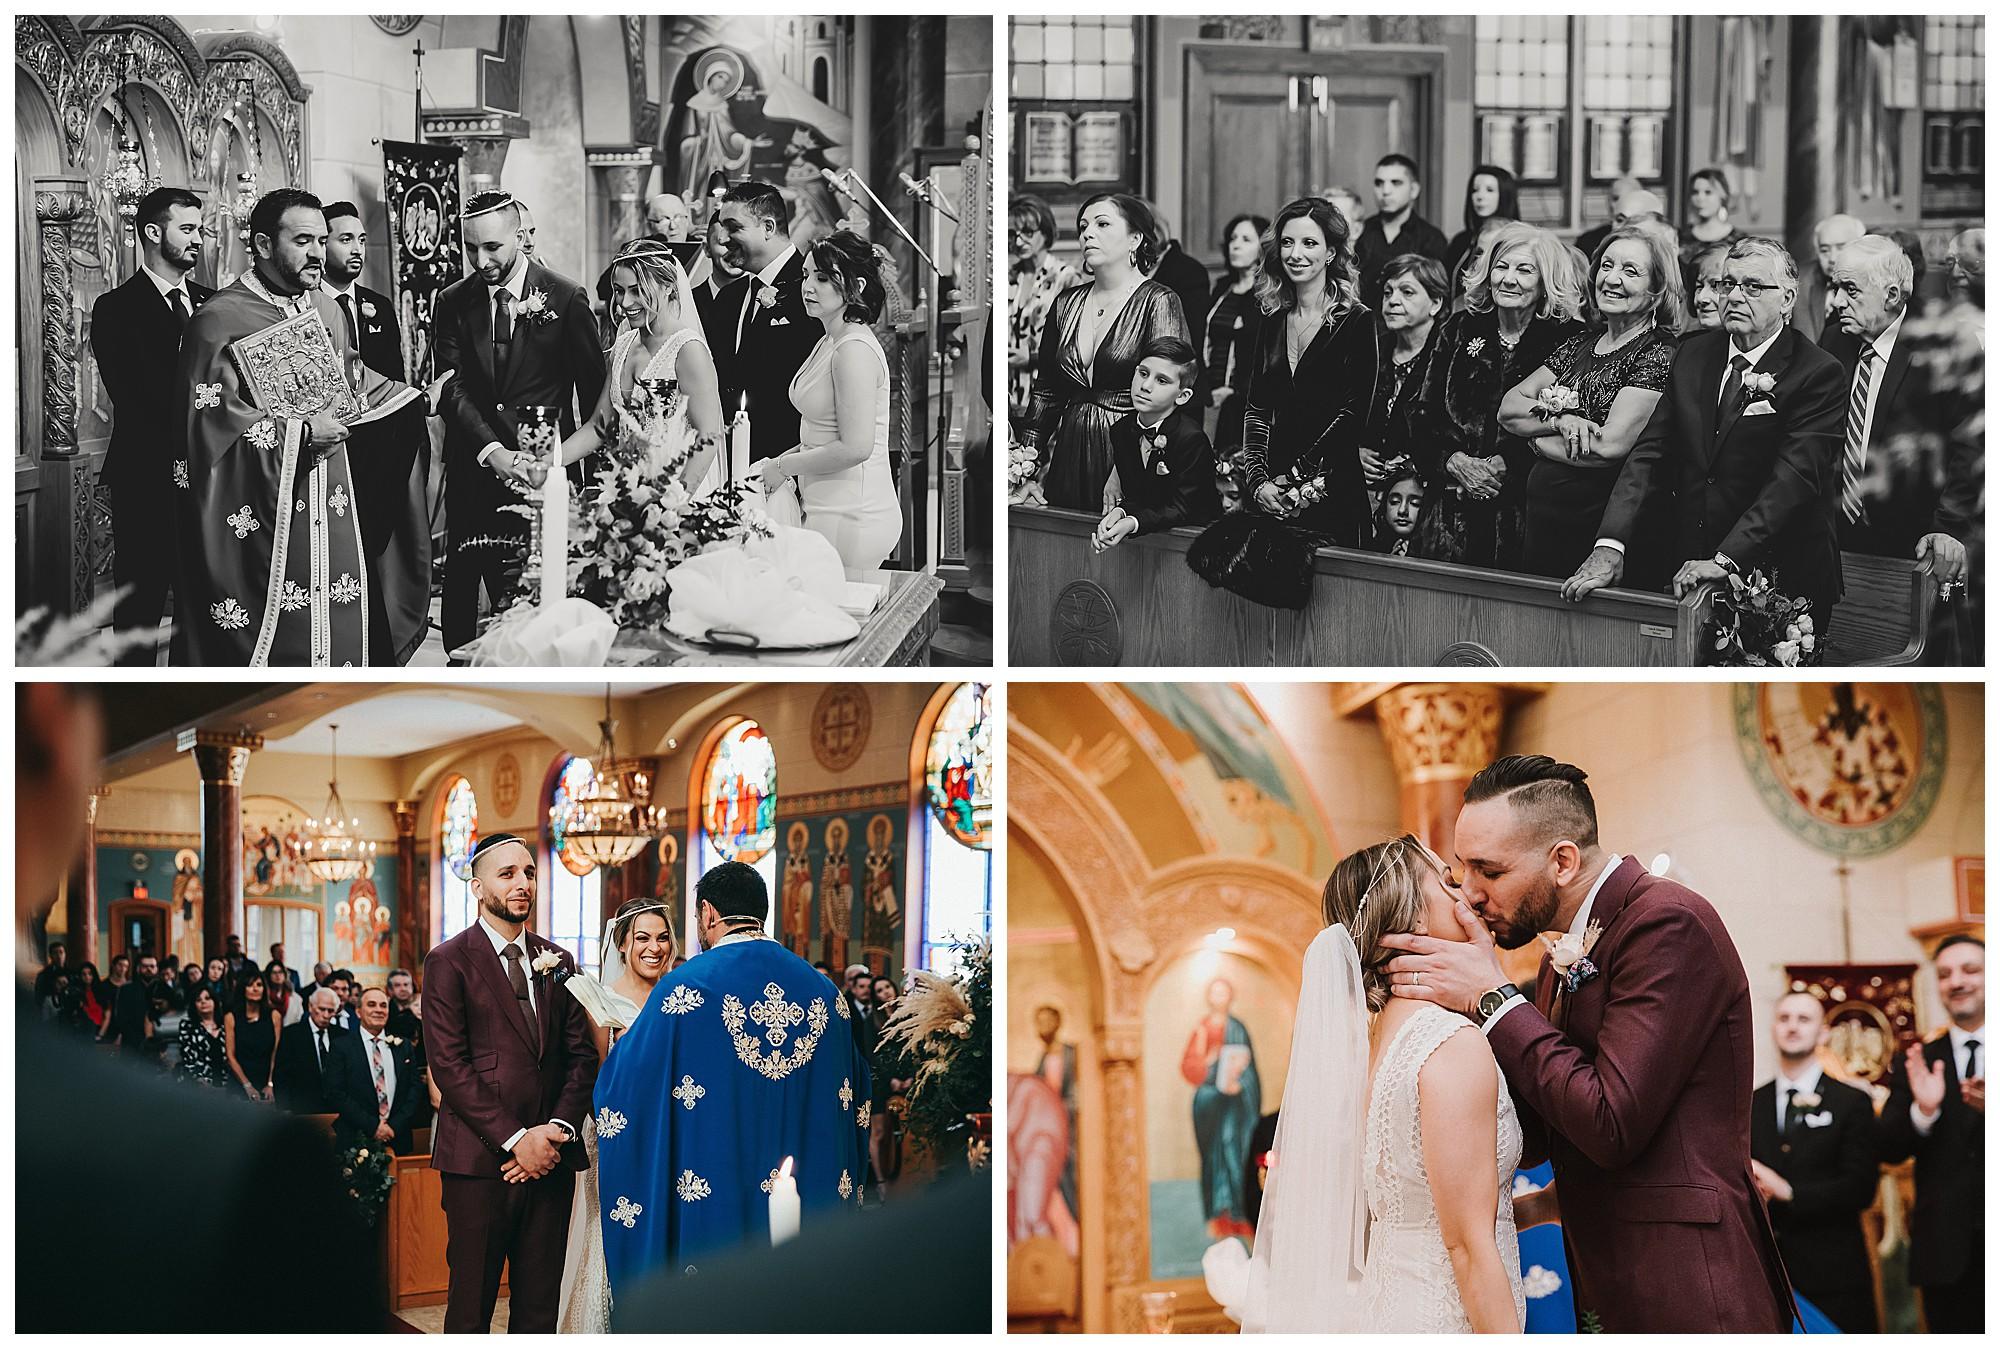 Joanna-Christos-Grand-Luxe-Wedding-Photos-Mint-Room-Toronto-VanDaele-Russell_0075.jpg